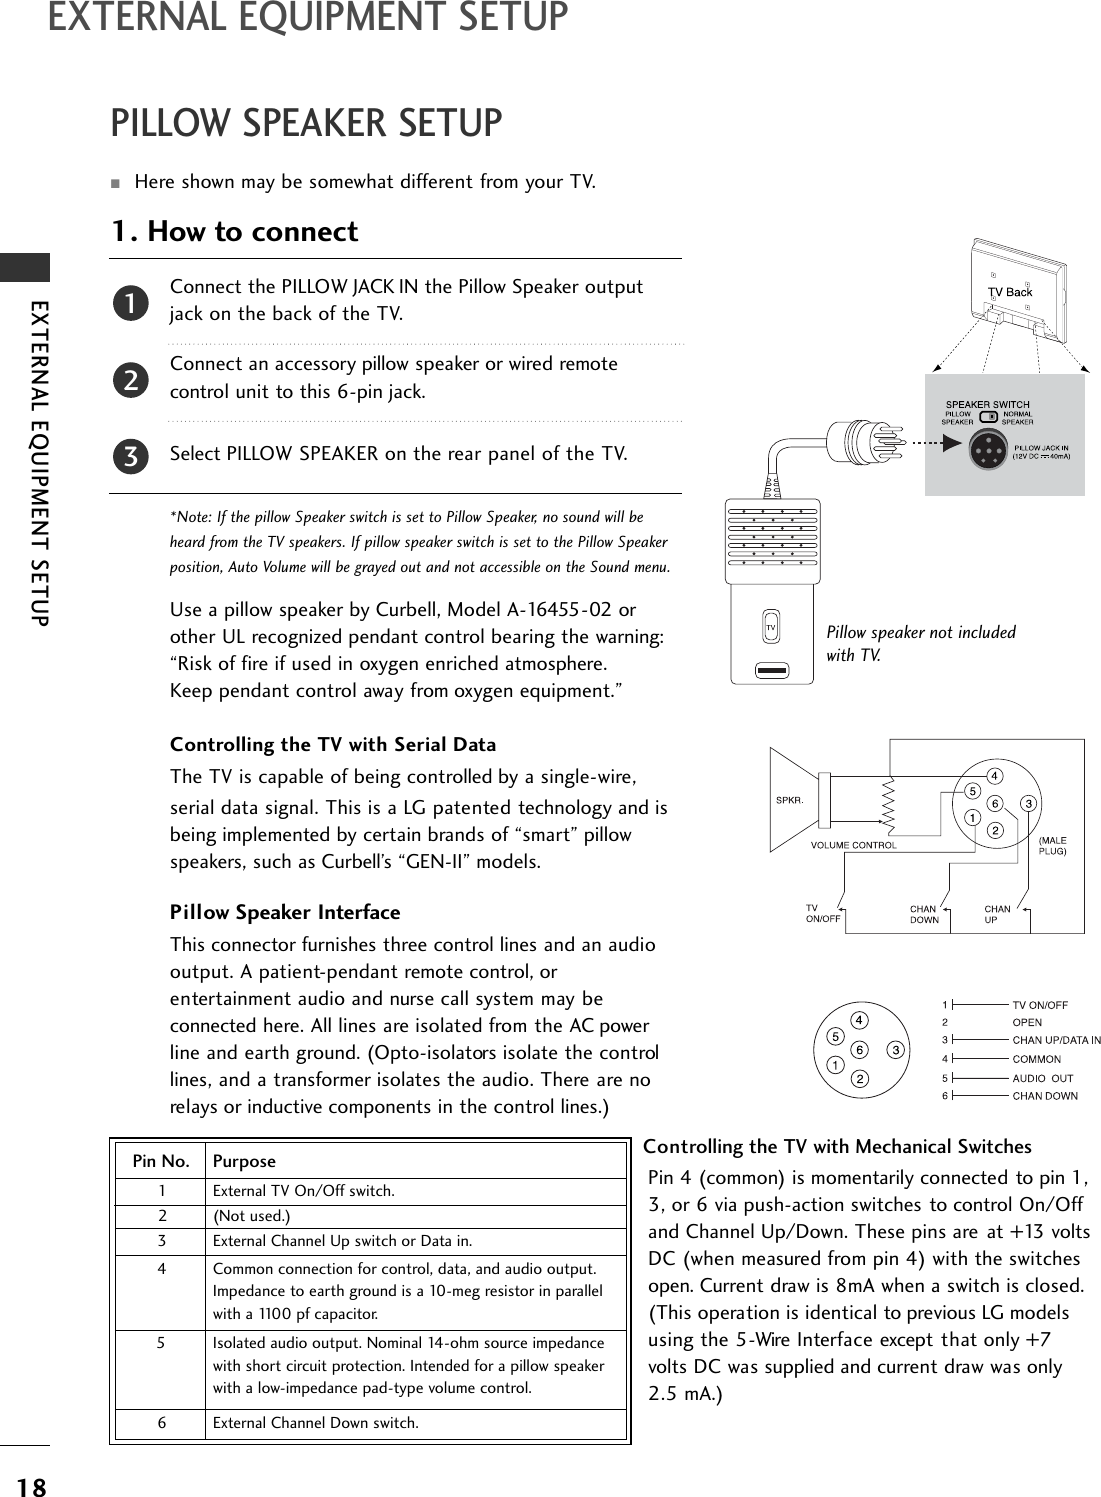 Lg 20Lh1Dc1 Users Manual 020C_CD20_hos_070920